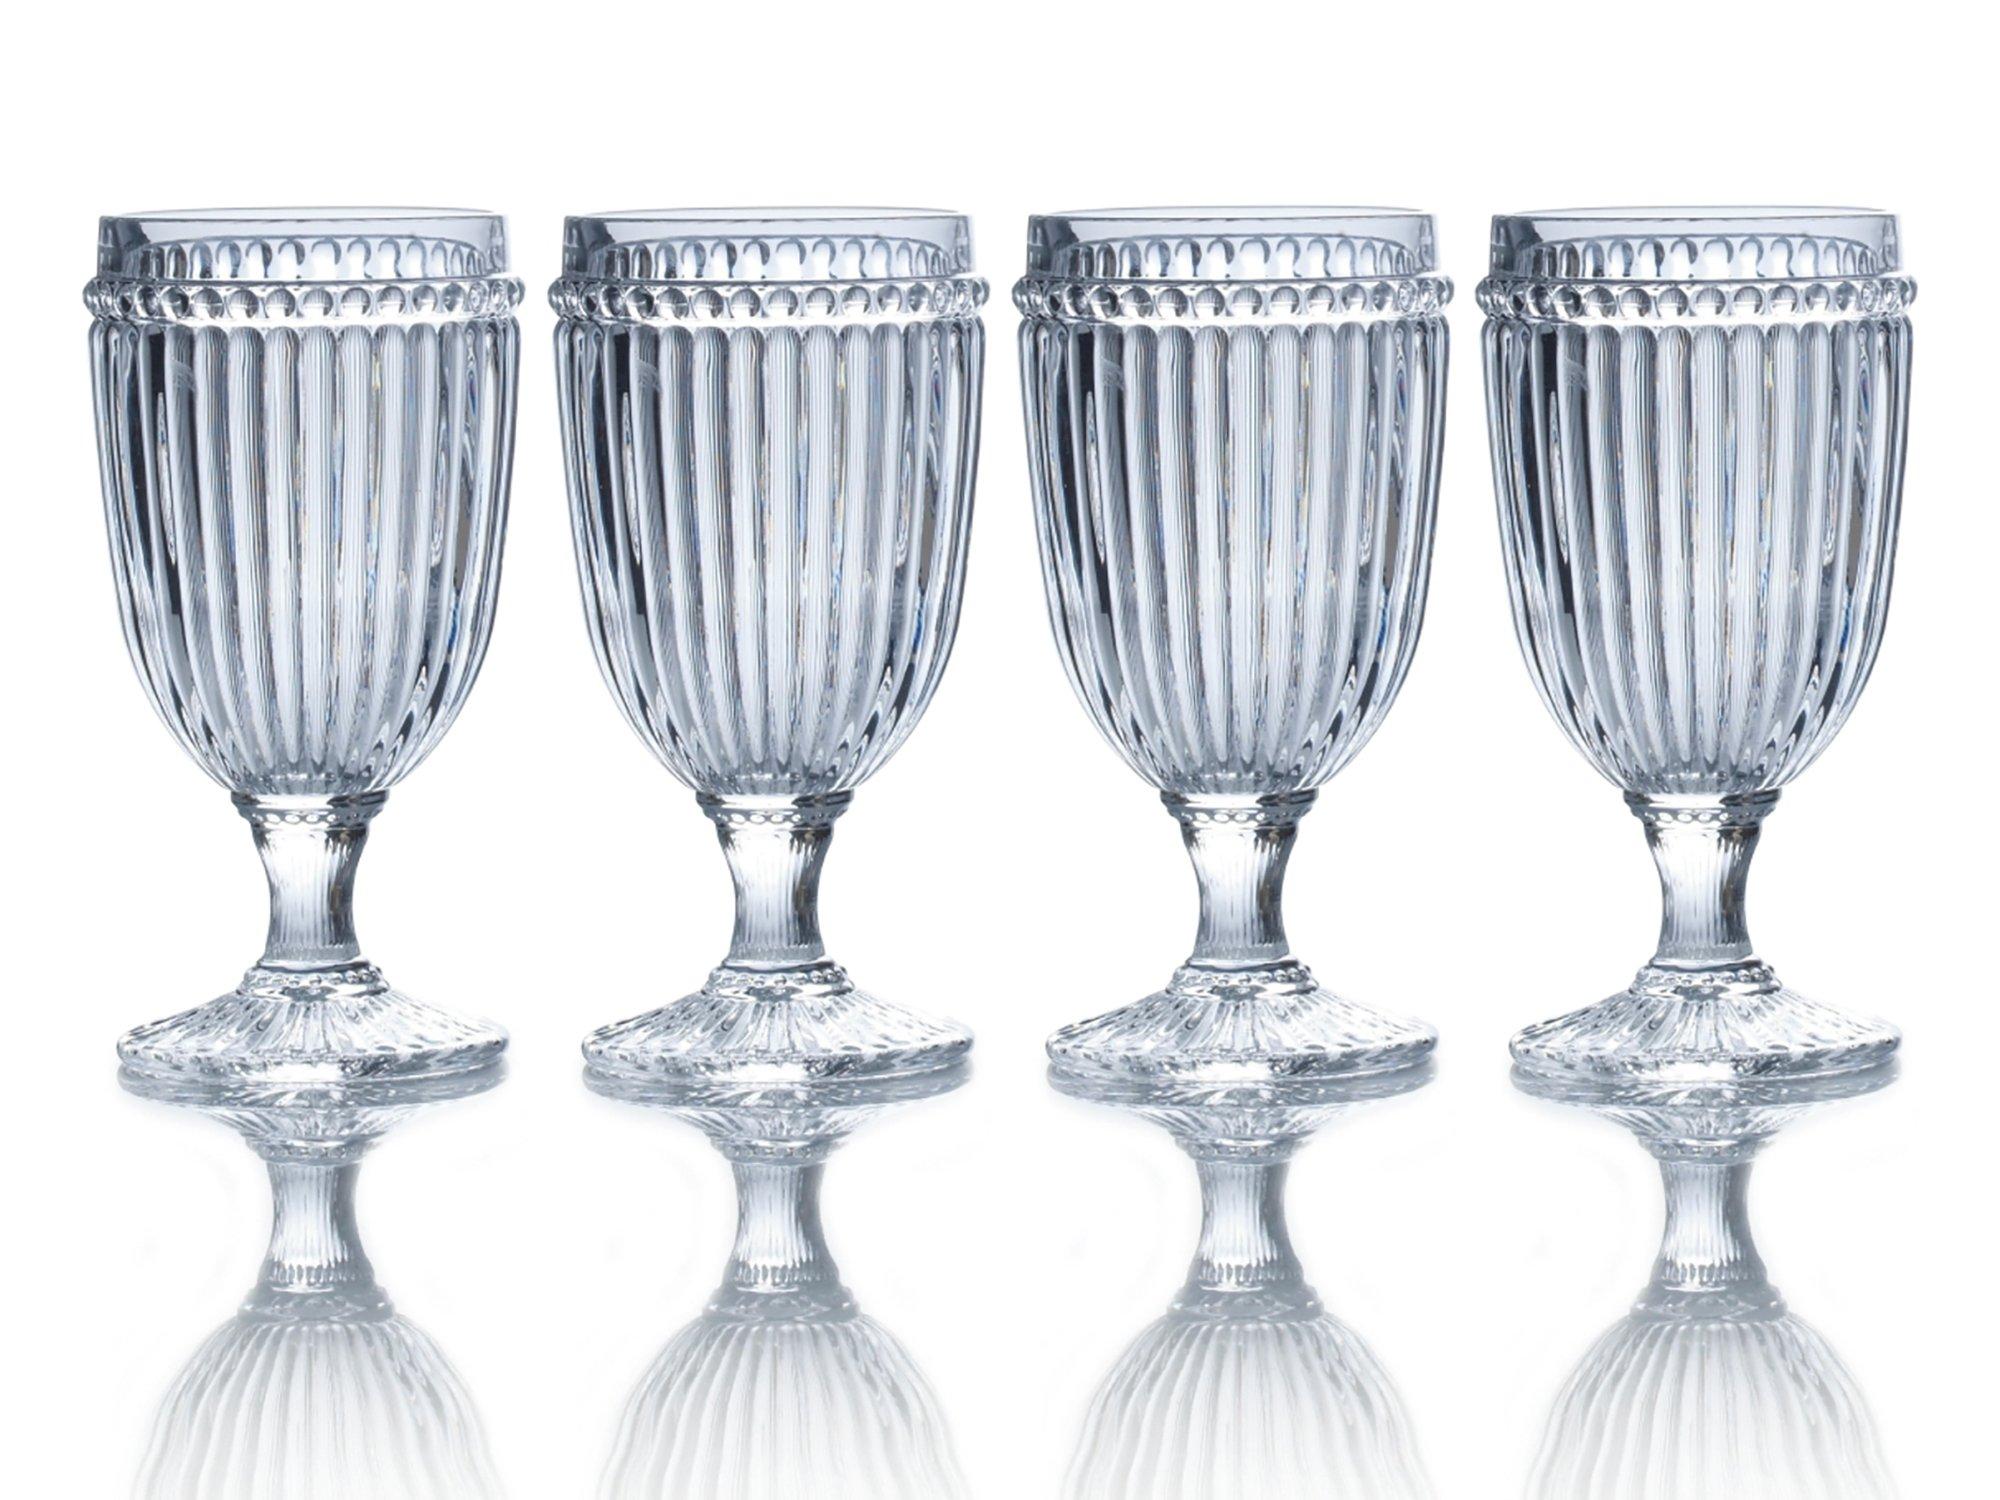 Mikasa Italian Countryside Iced Beverage Glass, Clea. 13-Ounce, Set of 4